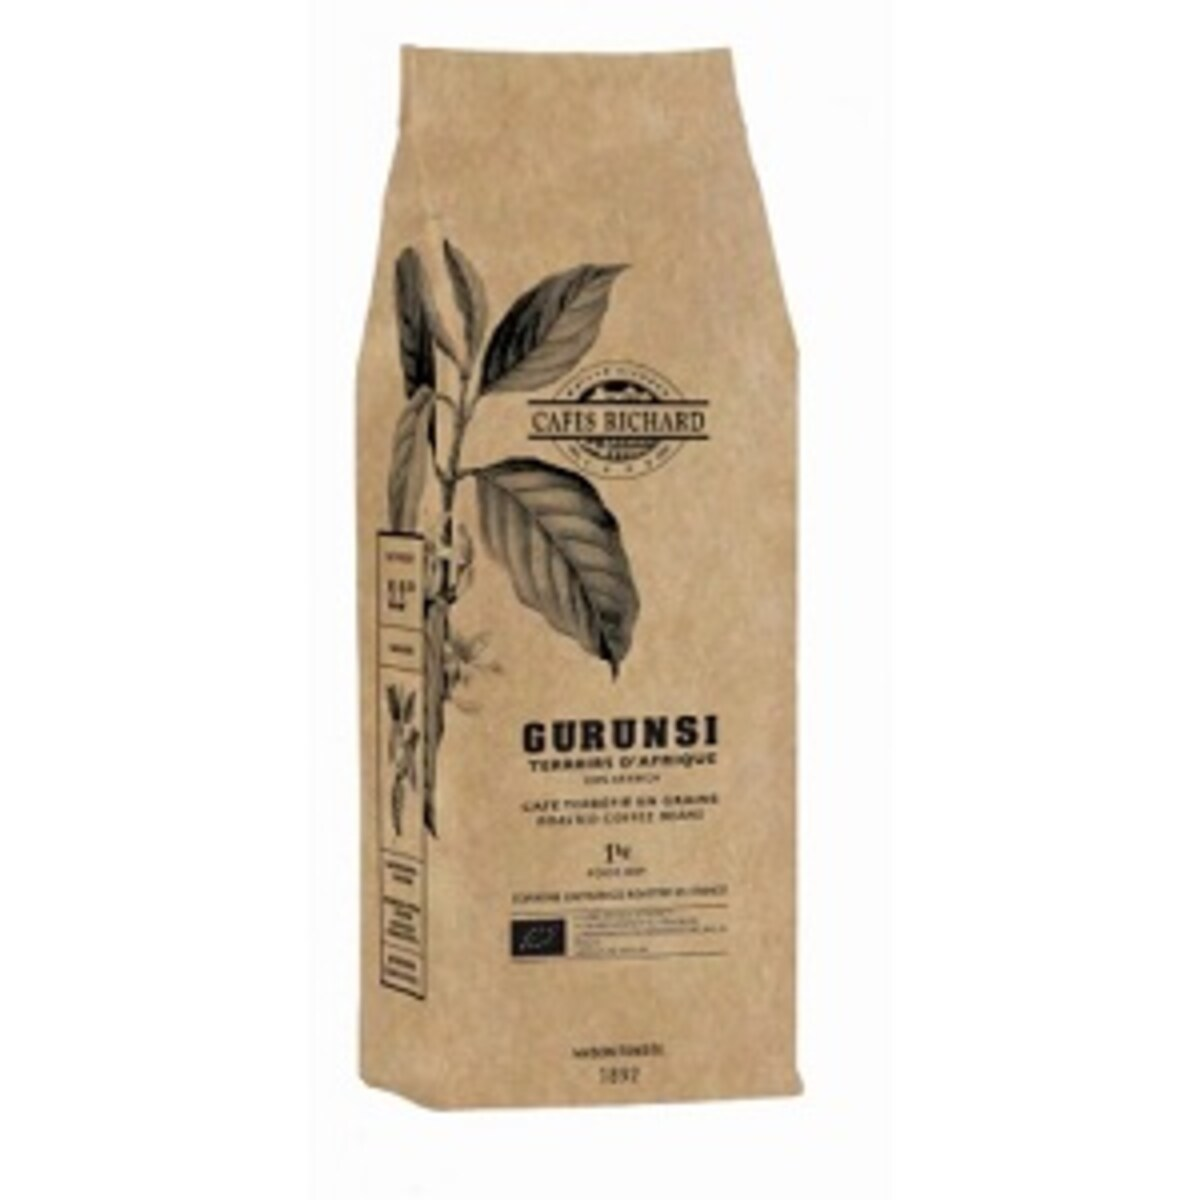 Terroirs D'Afrique Gurunsi Bio Boabe от Cafes Richard, кафе на зърна 1кг